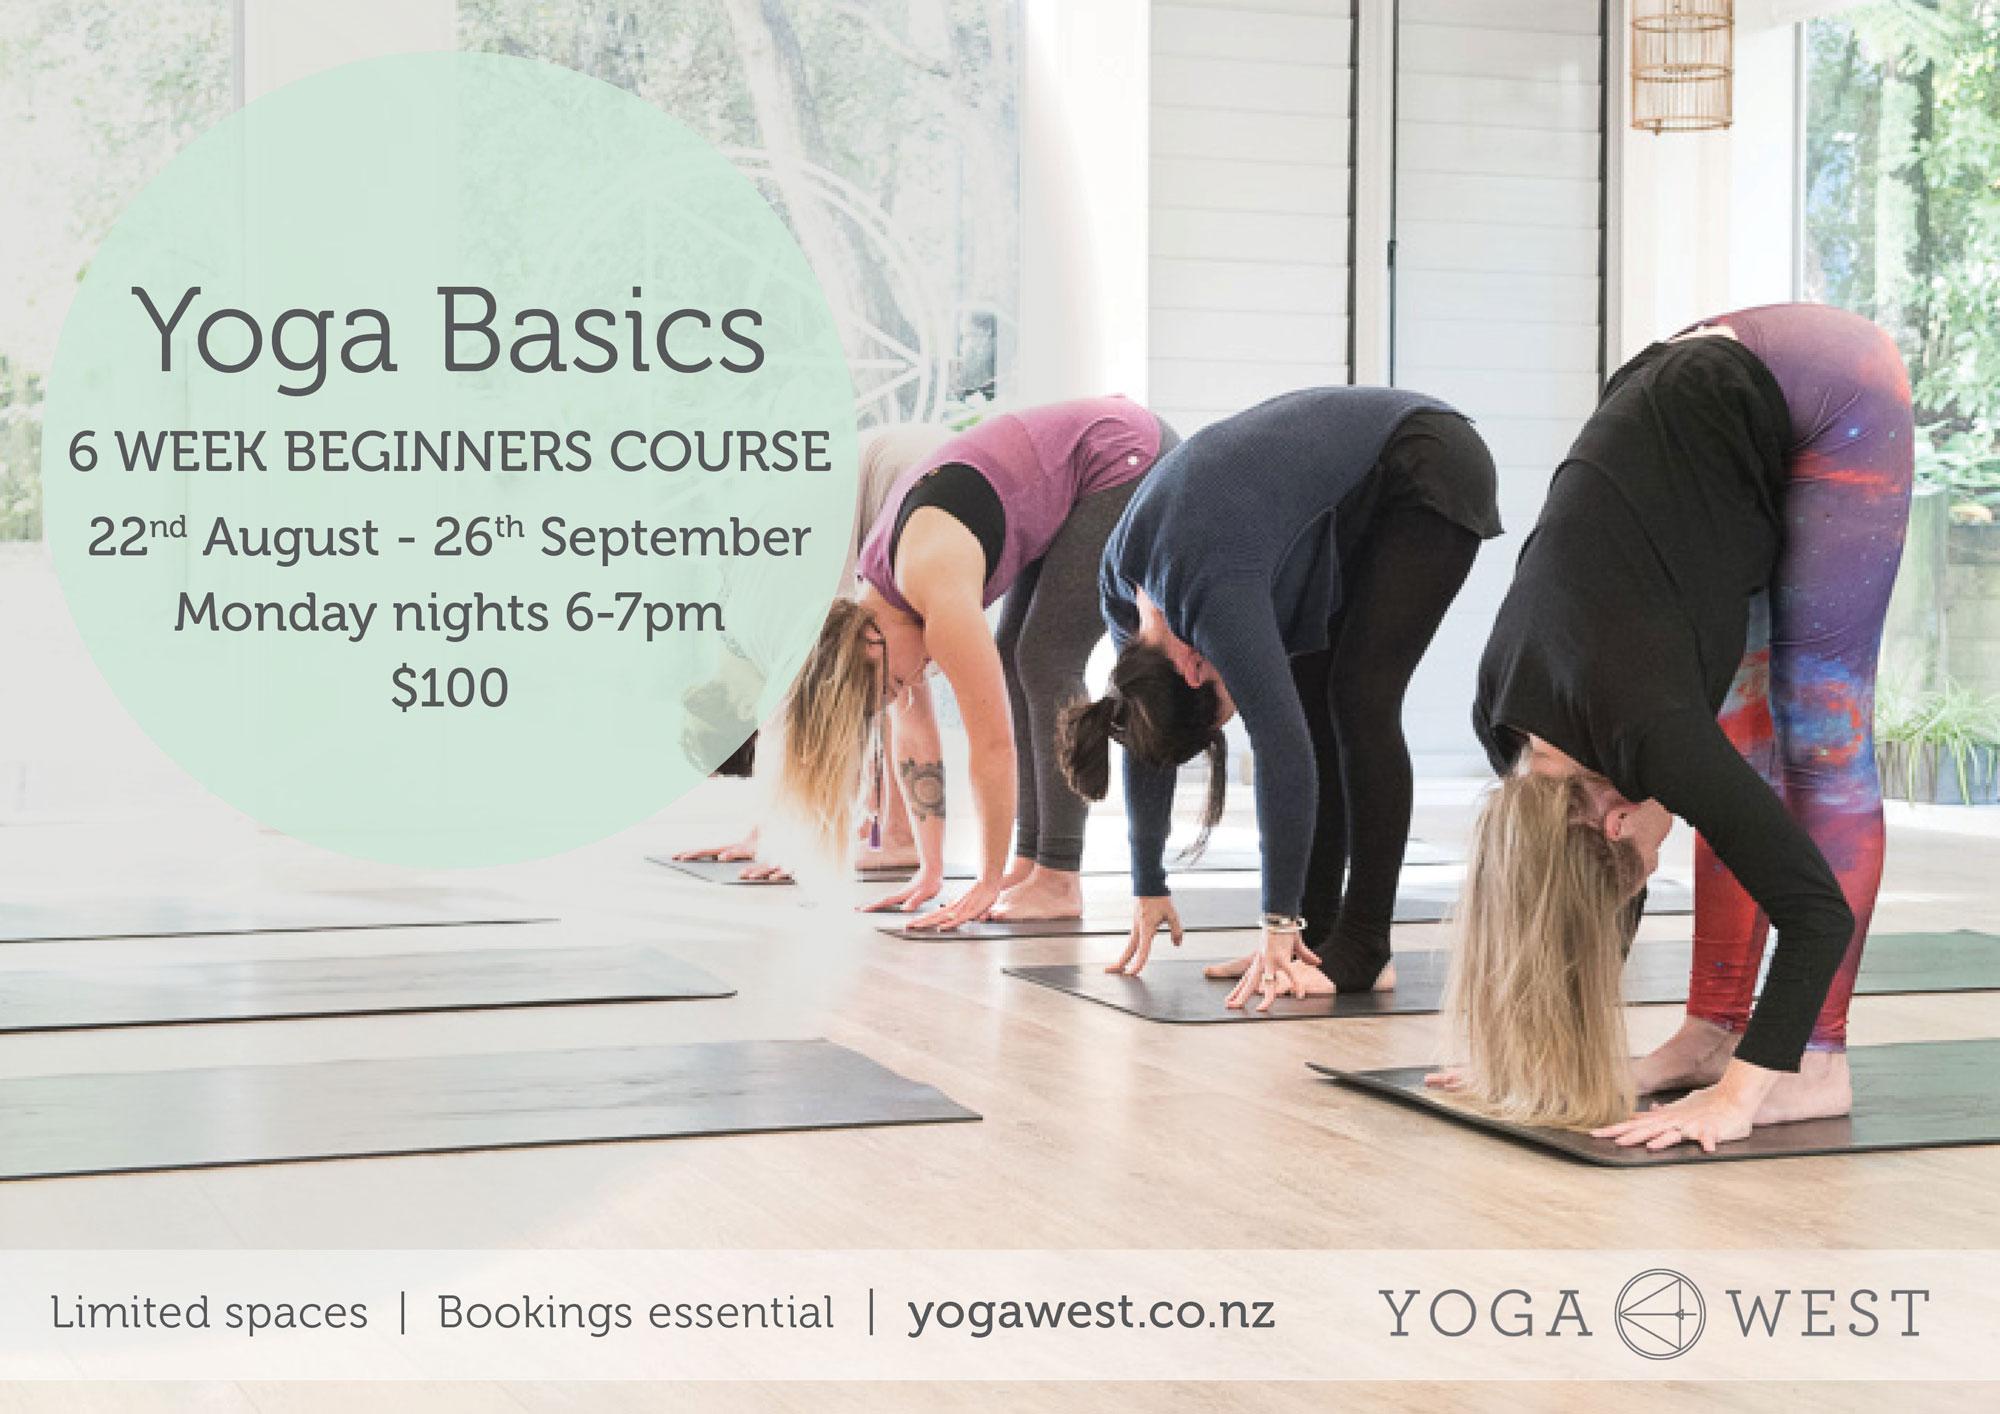 Yoga Basics Beginners Yoga Course